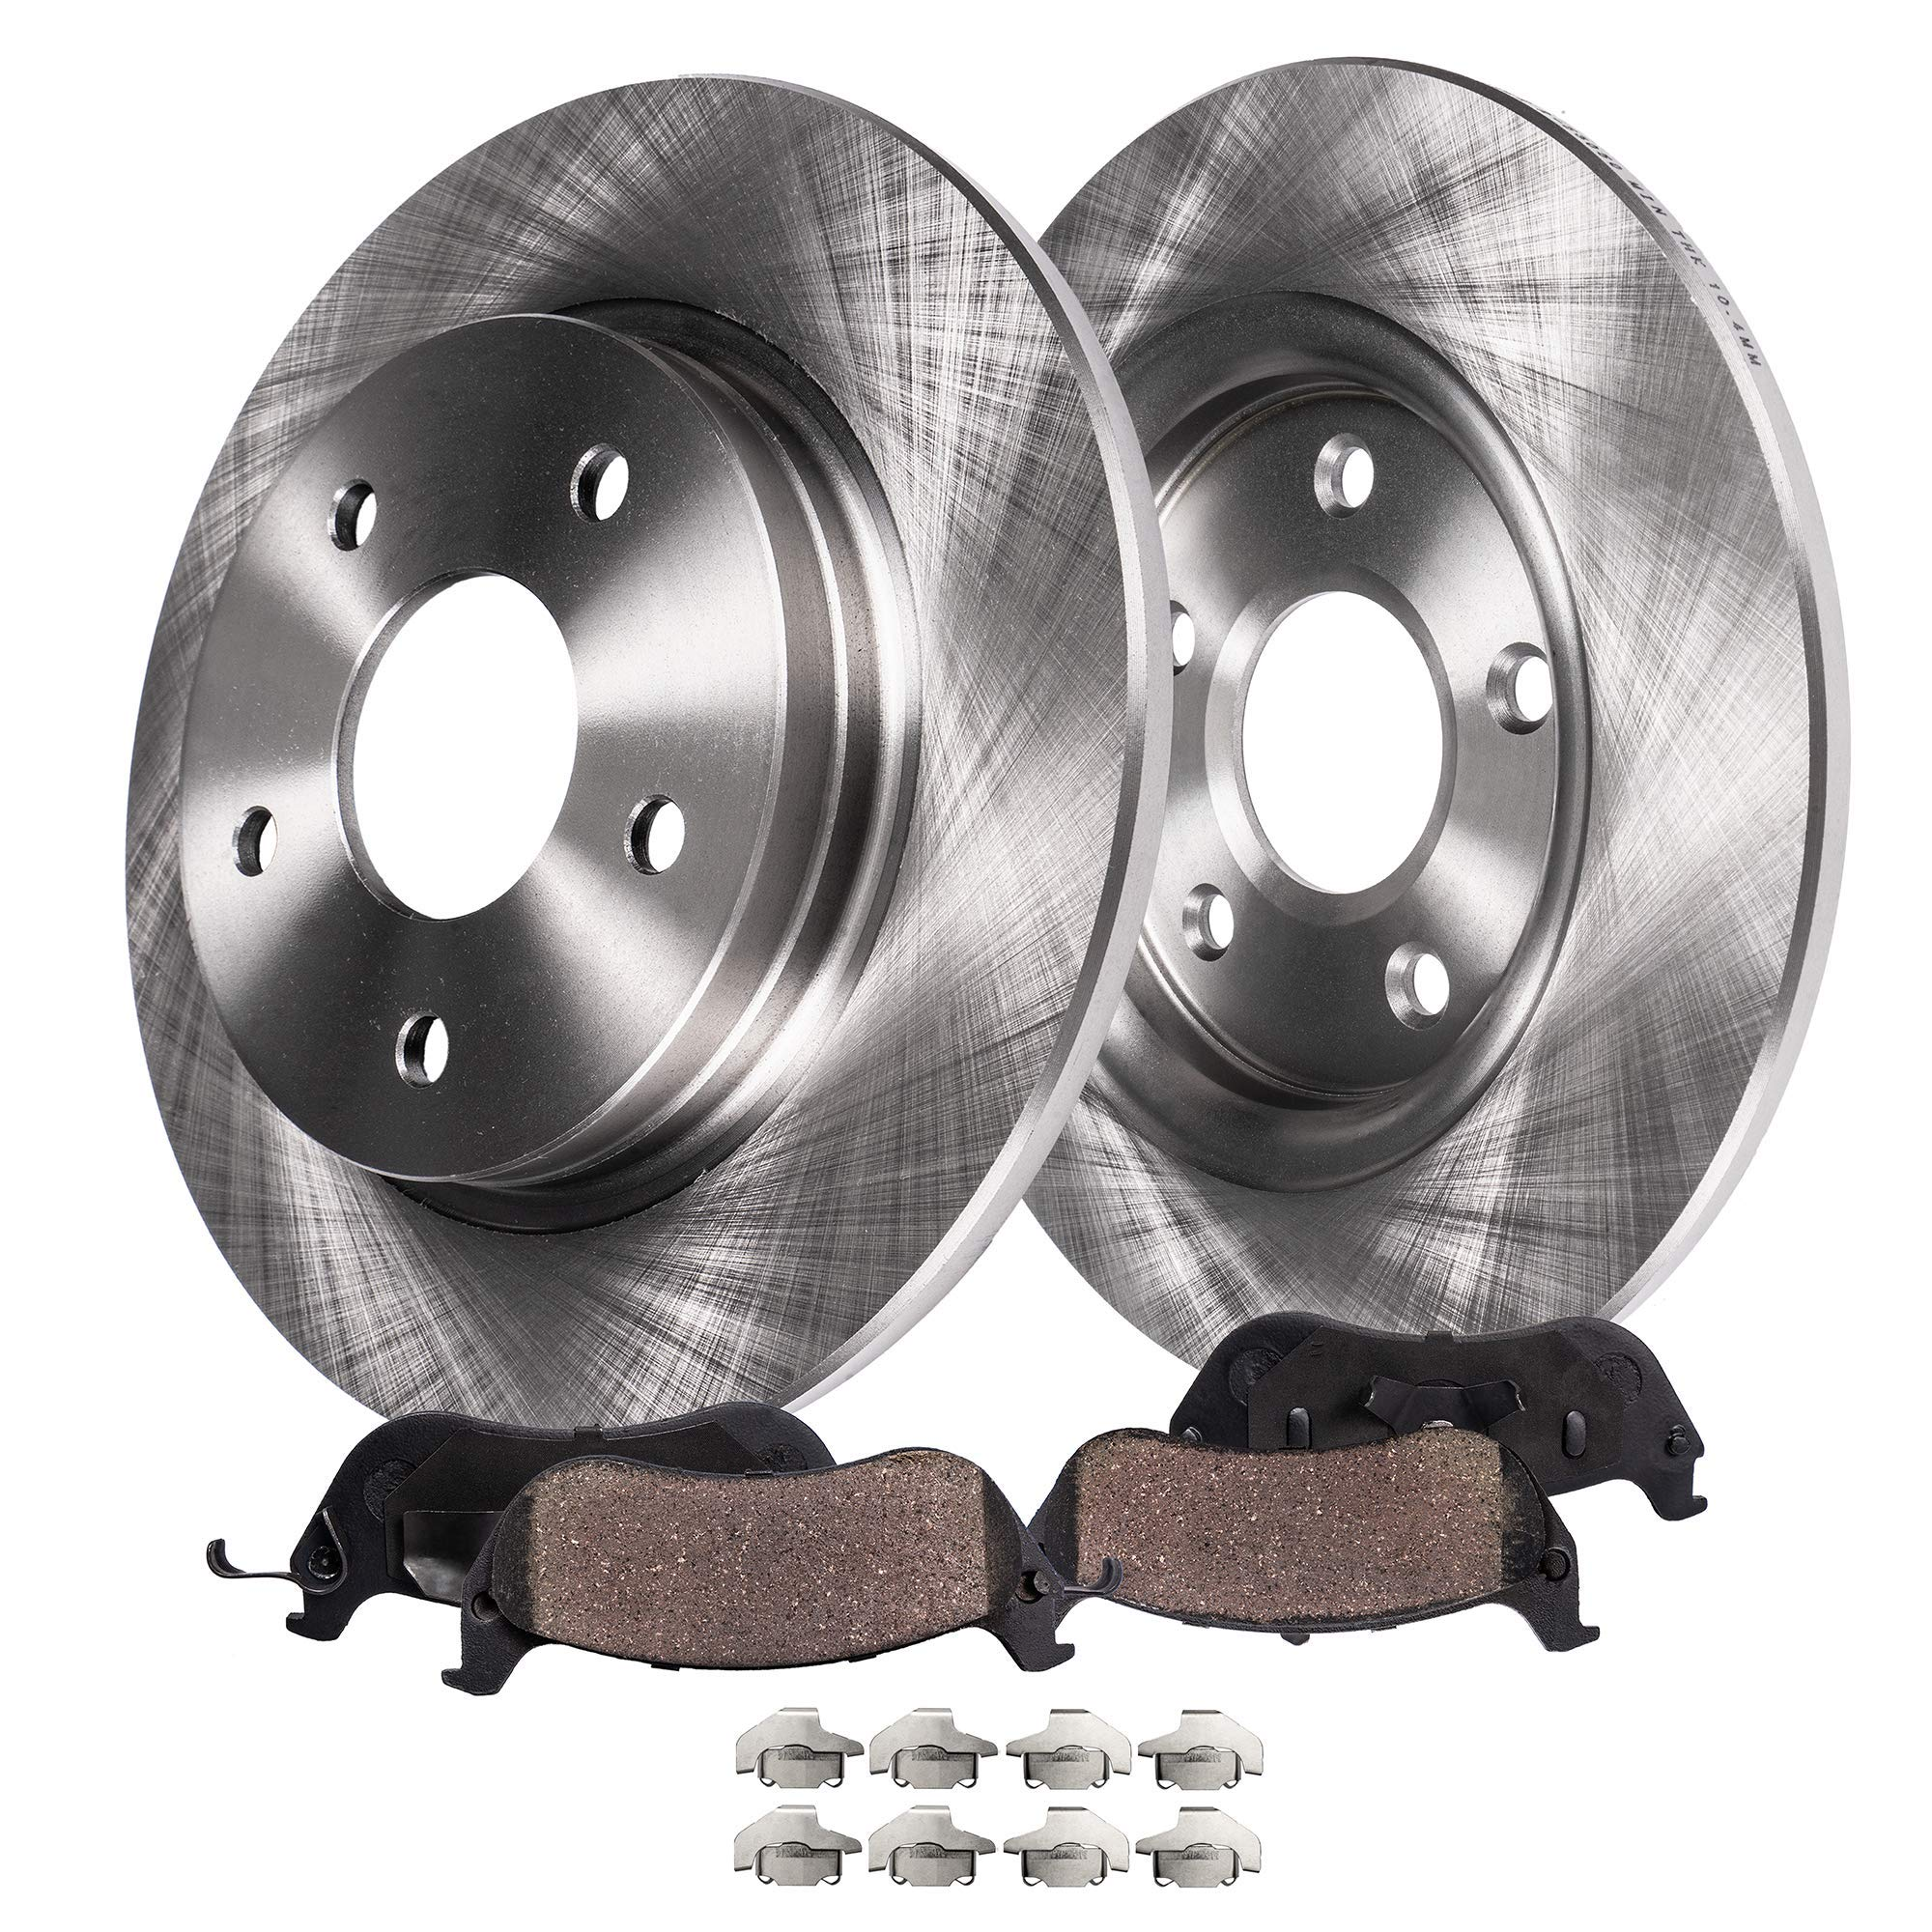 Fits: 2008 08 2009 09 Saturn Astra OE Series Rotors + Ceramic Pads Max Brakes Rear Supreme Brake Kit KM167642